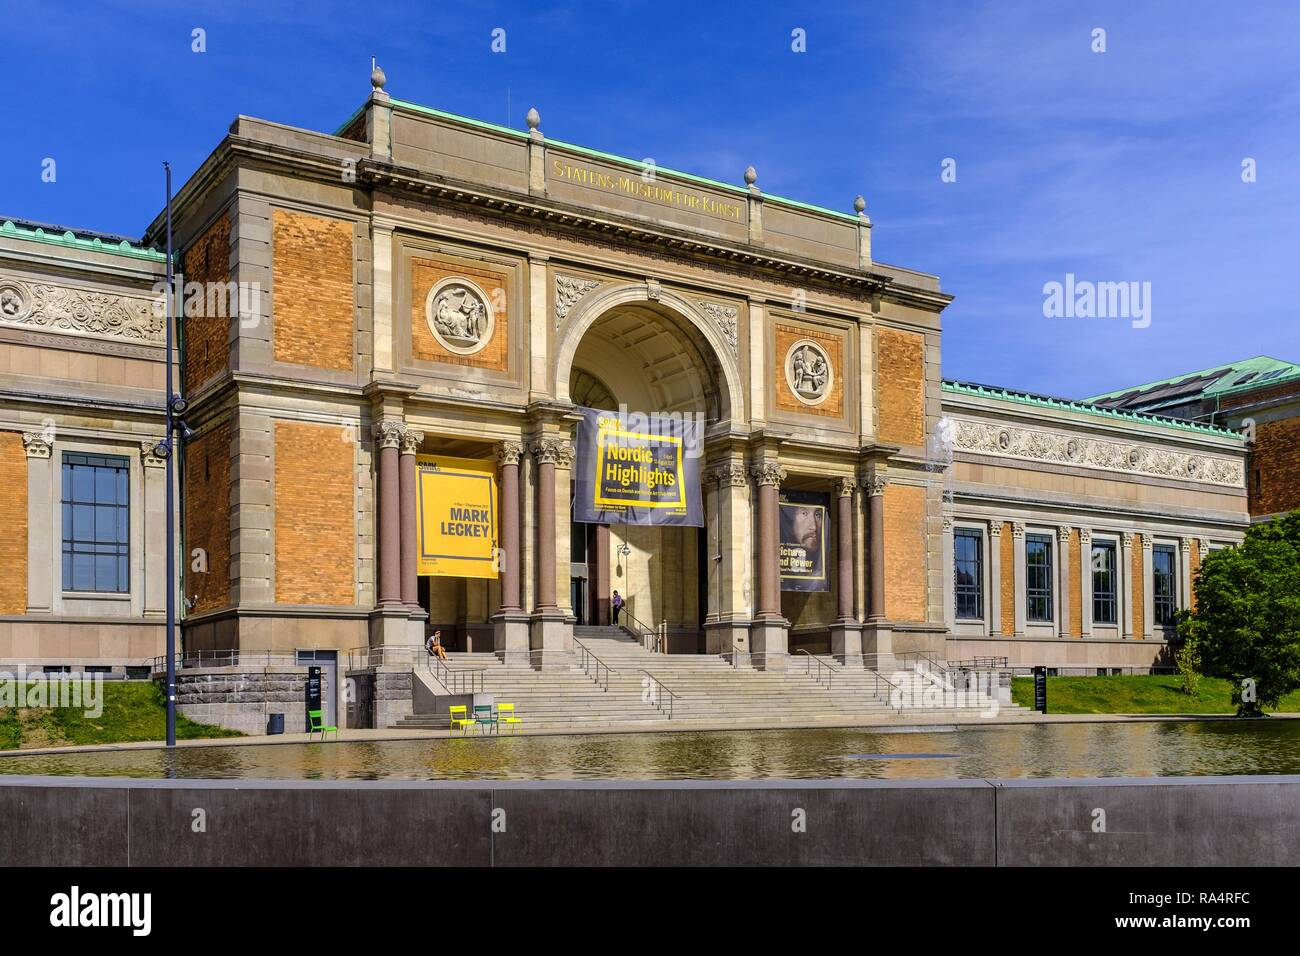 Dania - region Zealand - Kopenhaga - Panstwowe Muzeum Sztuki glowny budynek - Galeria Narodowa Denmark - Zealand region - Copenhagen city center - National Gallery main building - Stock Image